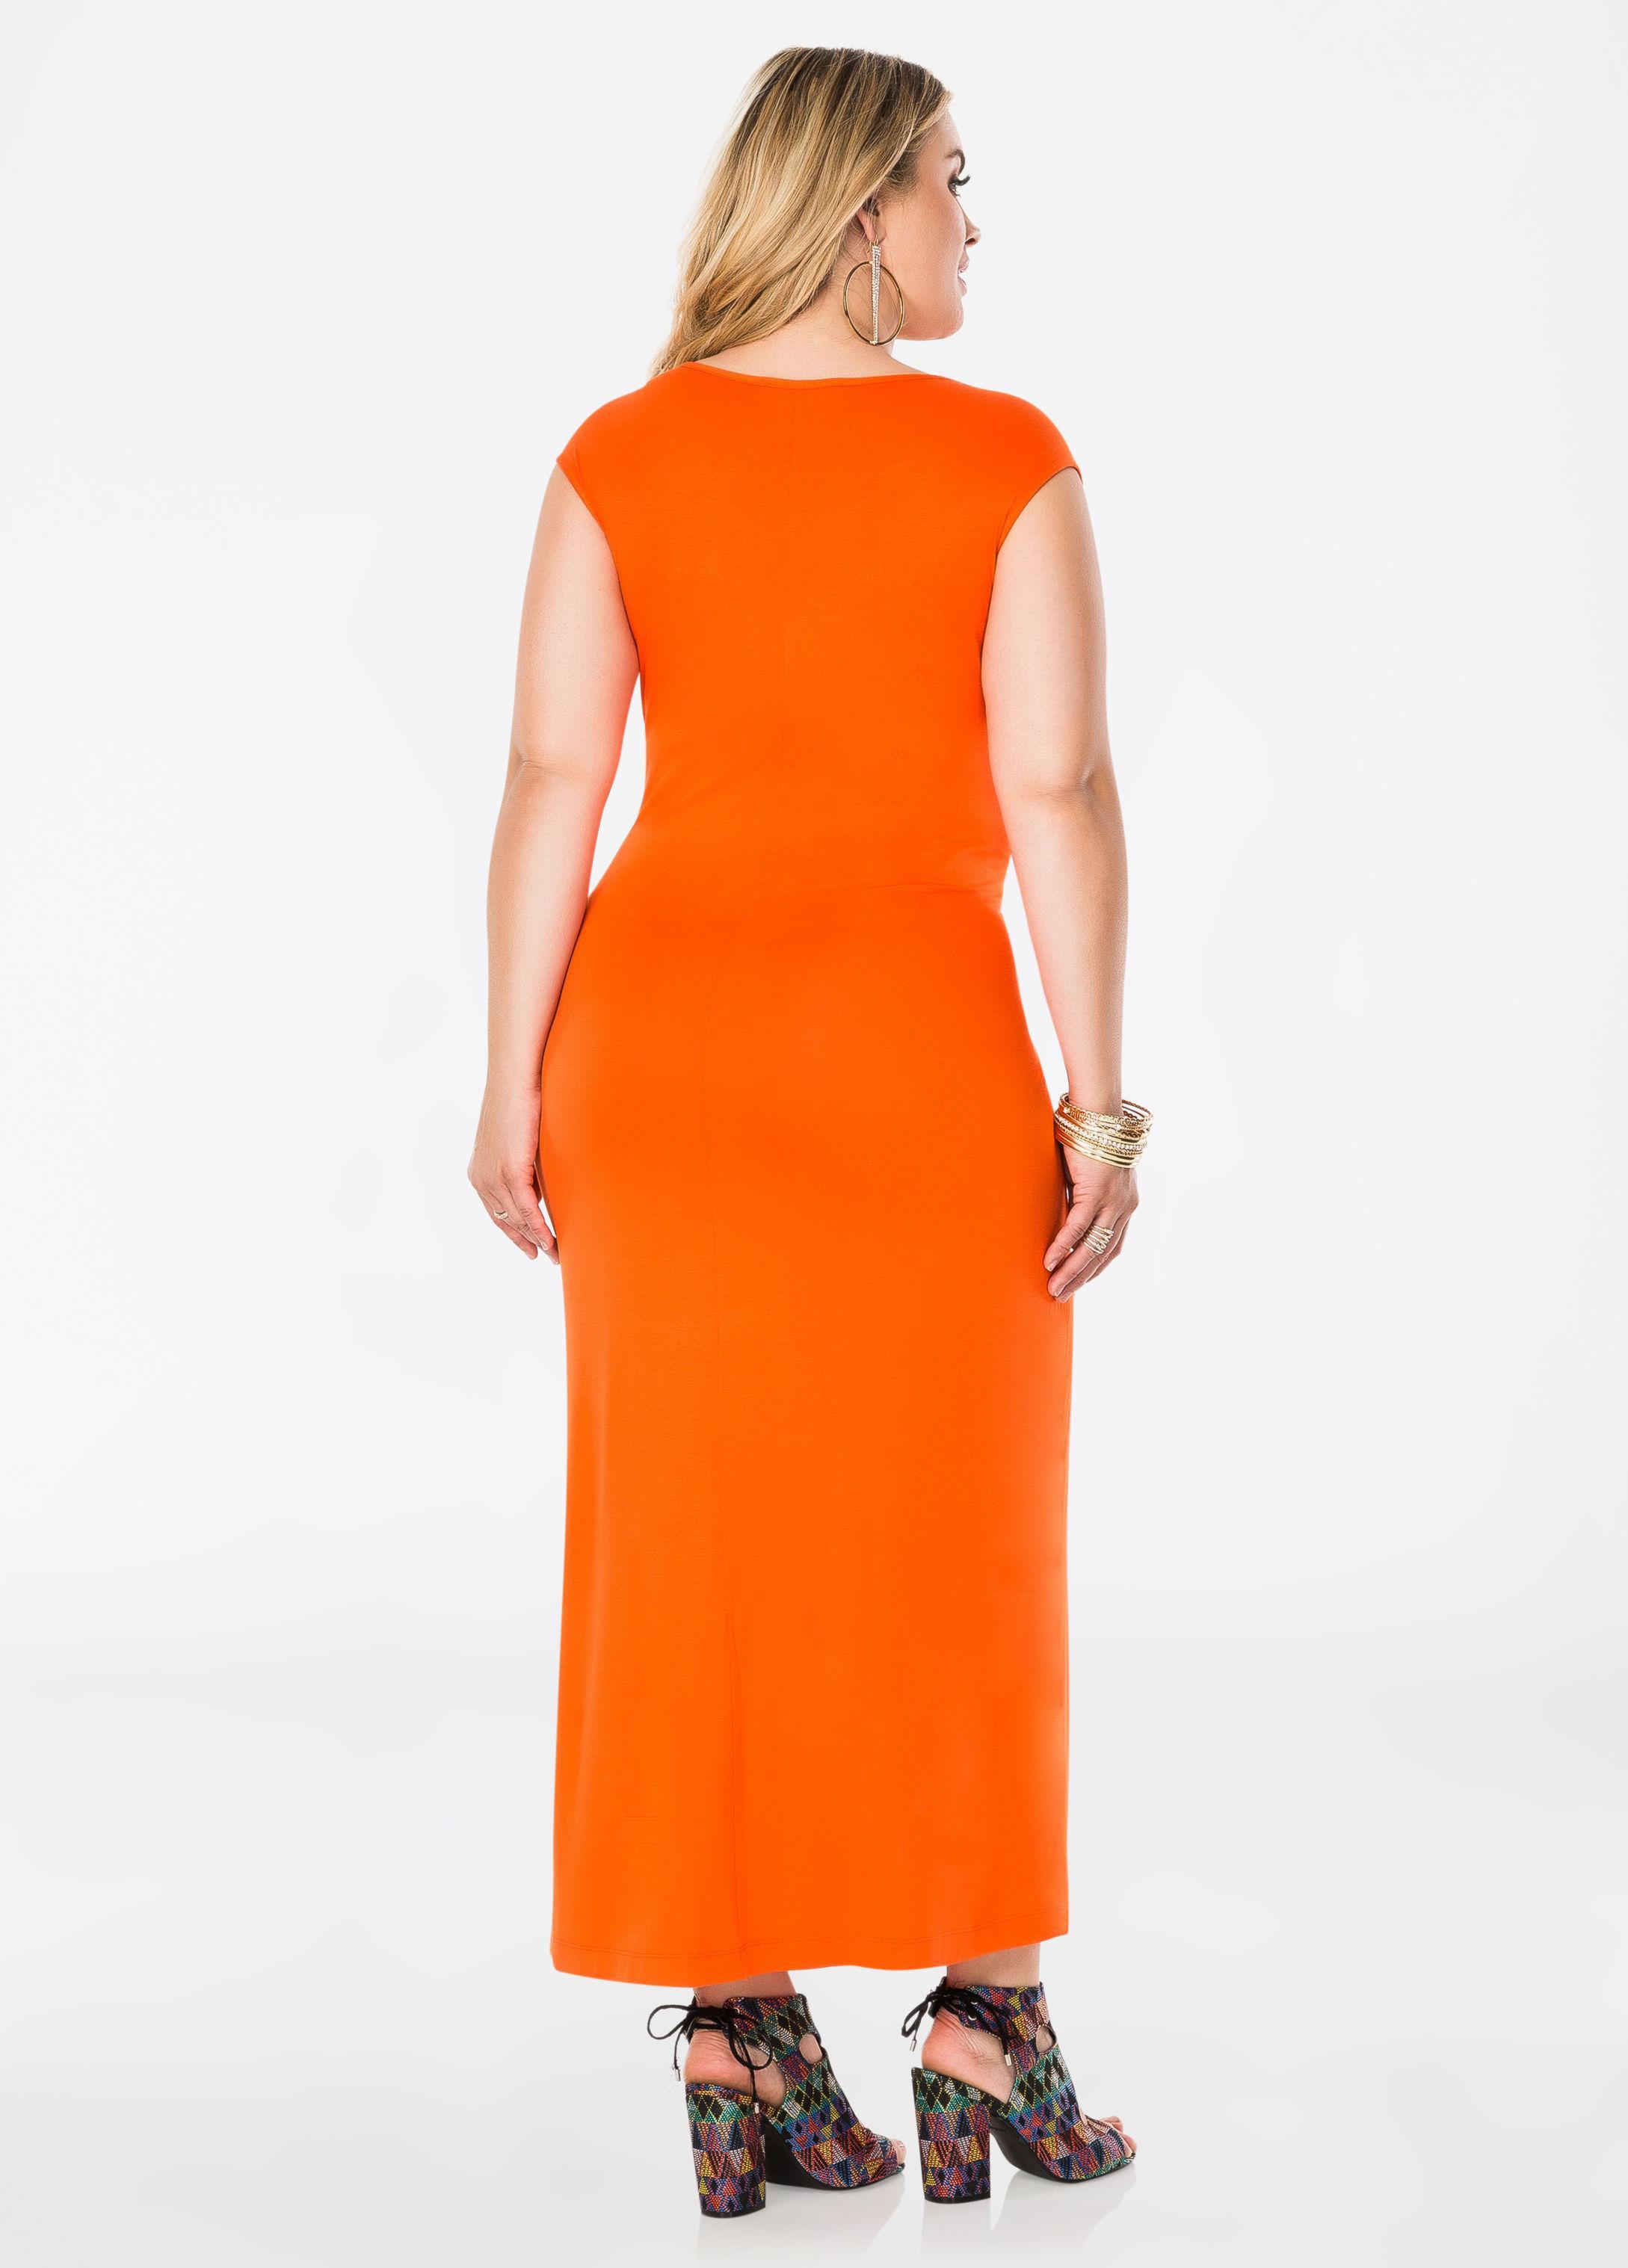 98fc3621d28 Lyst - Ashley Stewart Draped Knot Front Maxi Dress in Orange